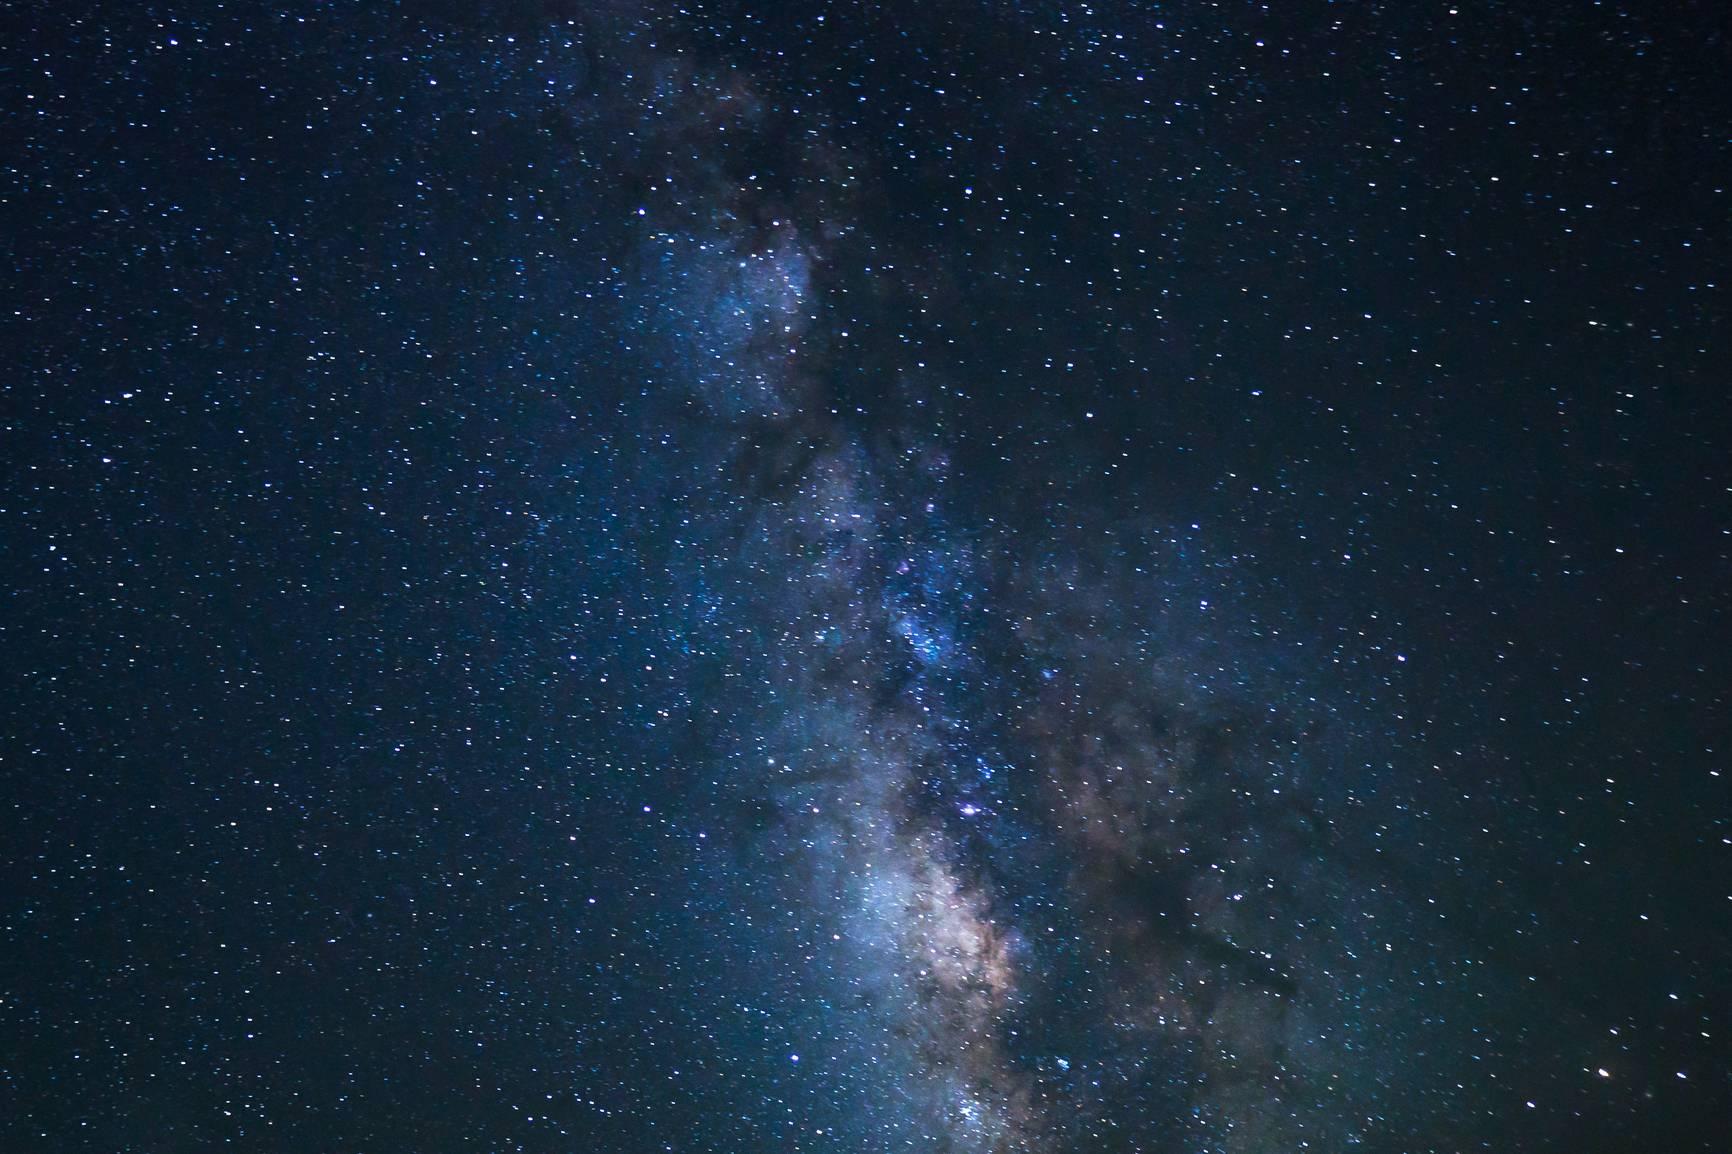 city night sky background - photo #35